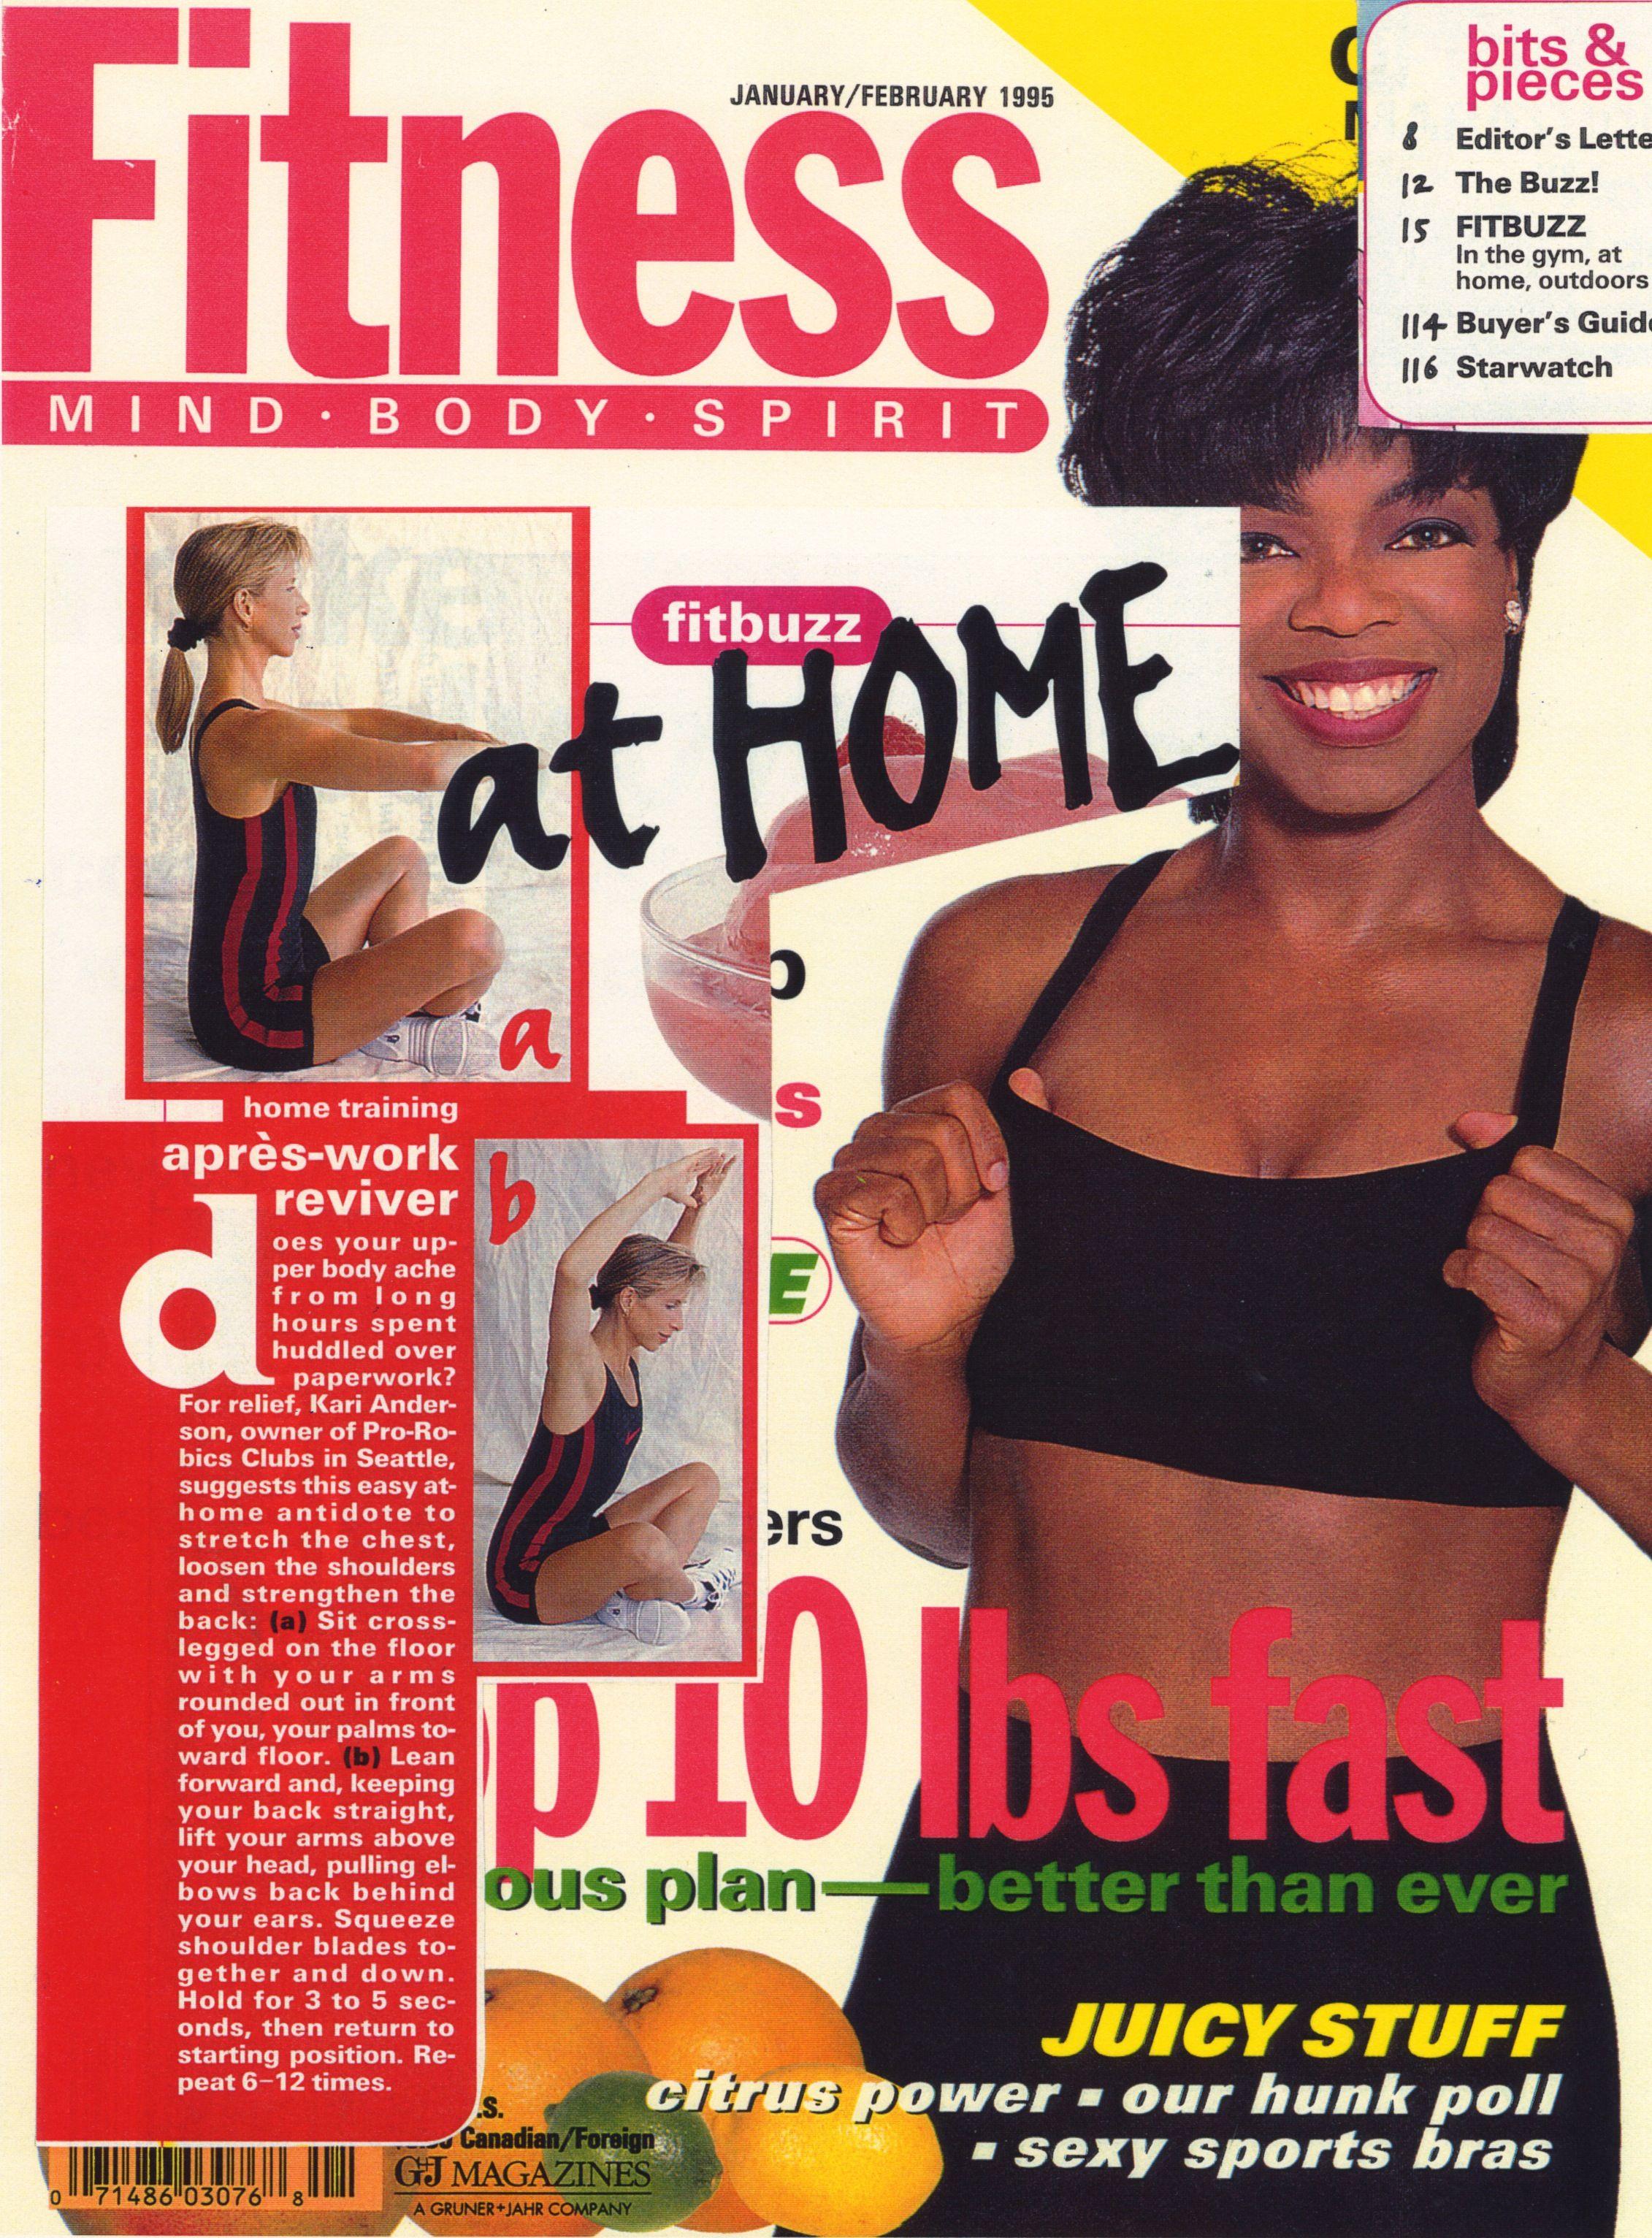 Fitness Magazine Fitness Magazine Excercise Fitness